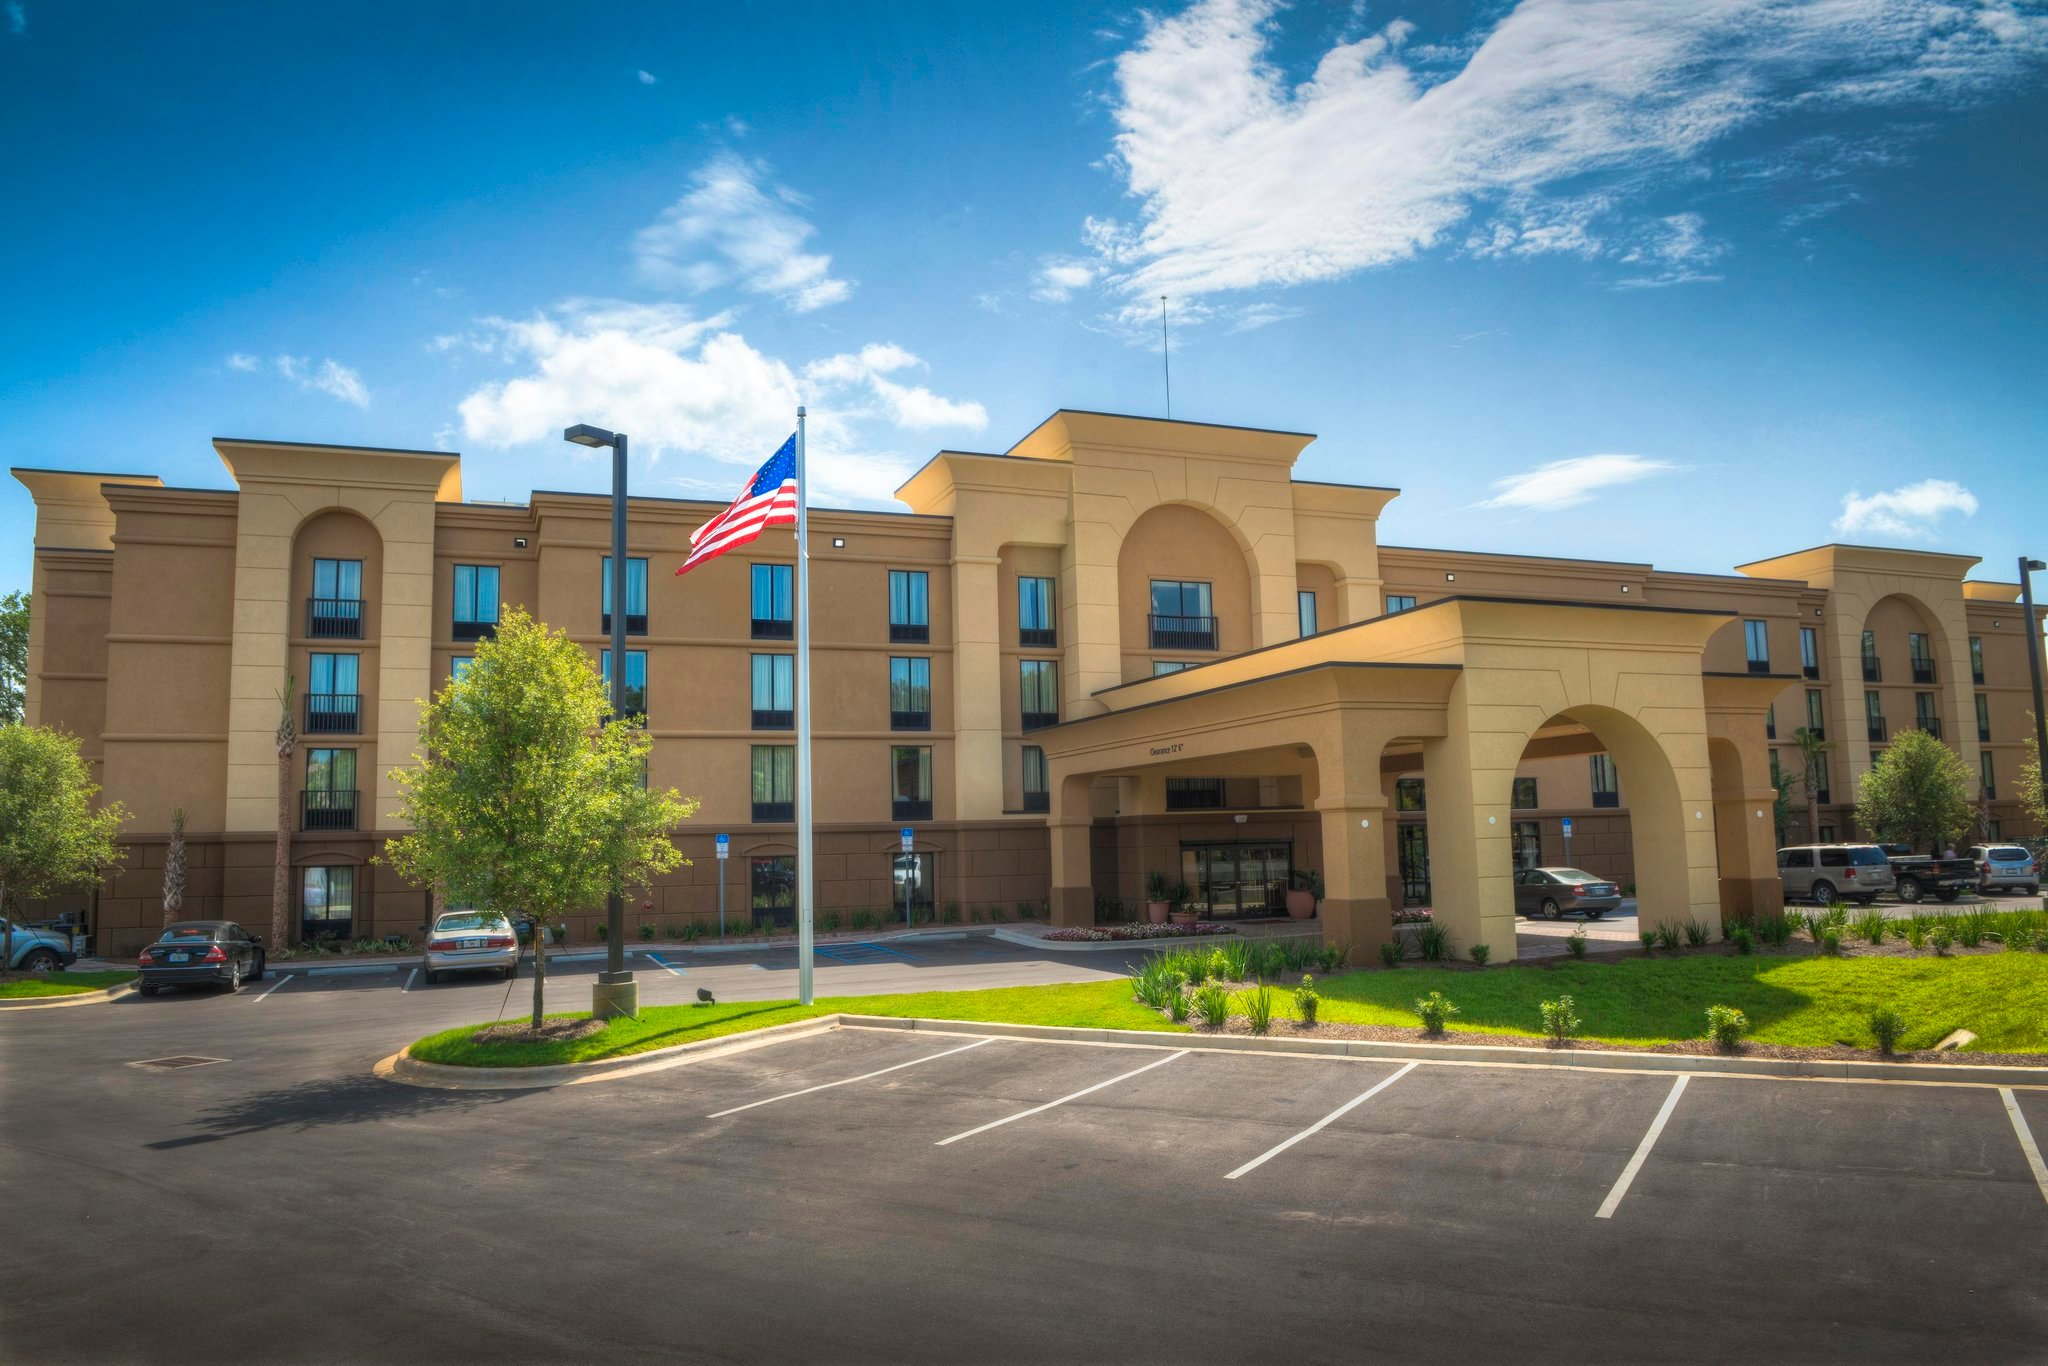 Hampton Inn & Suites Pensacola/Gulf Breeze